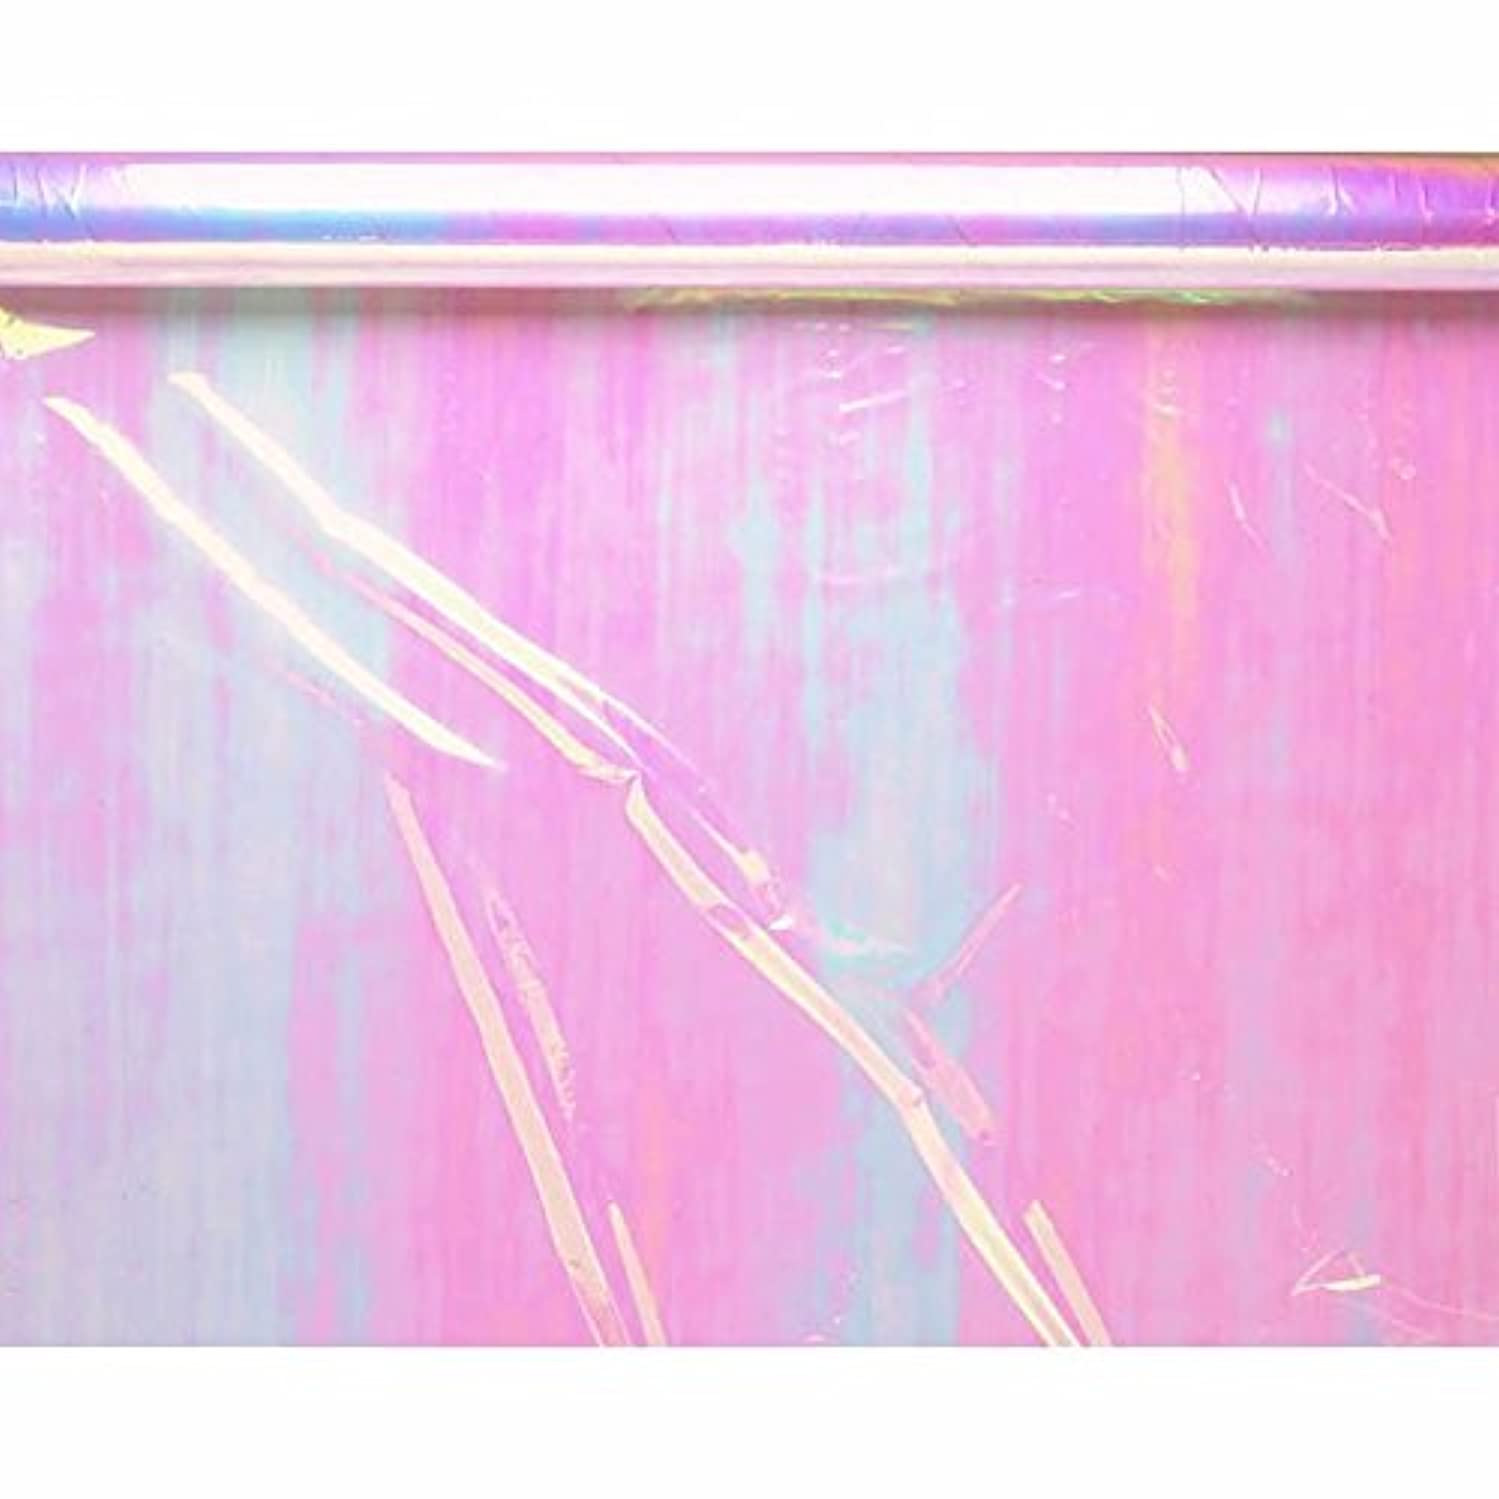 Amscan 189104 Cellophane Wrap, 10' x 30